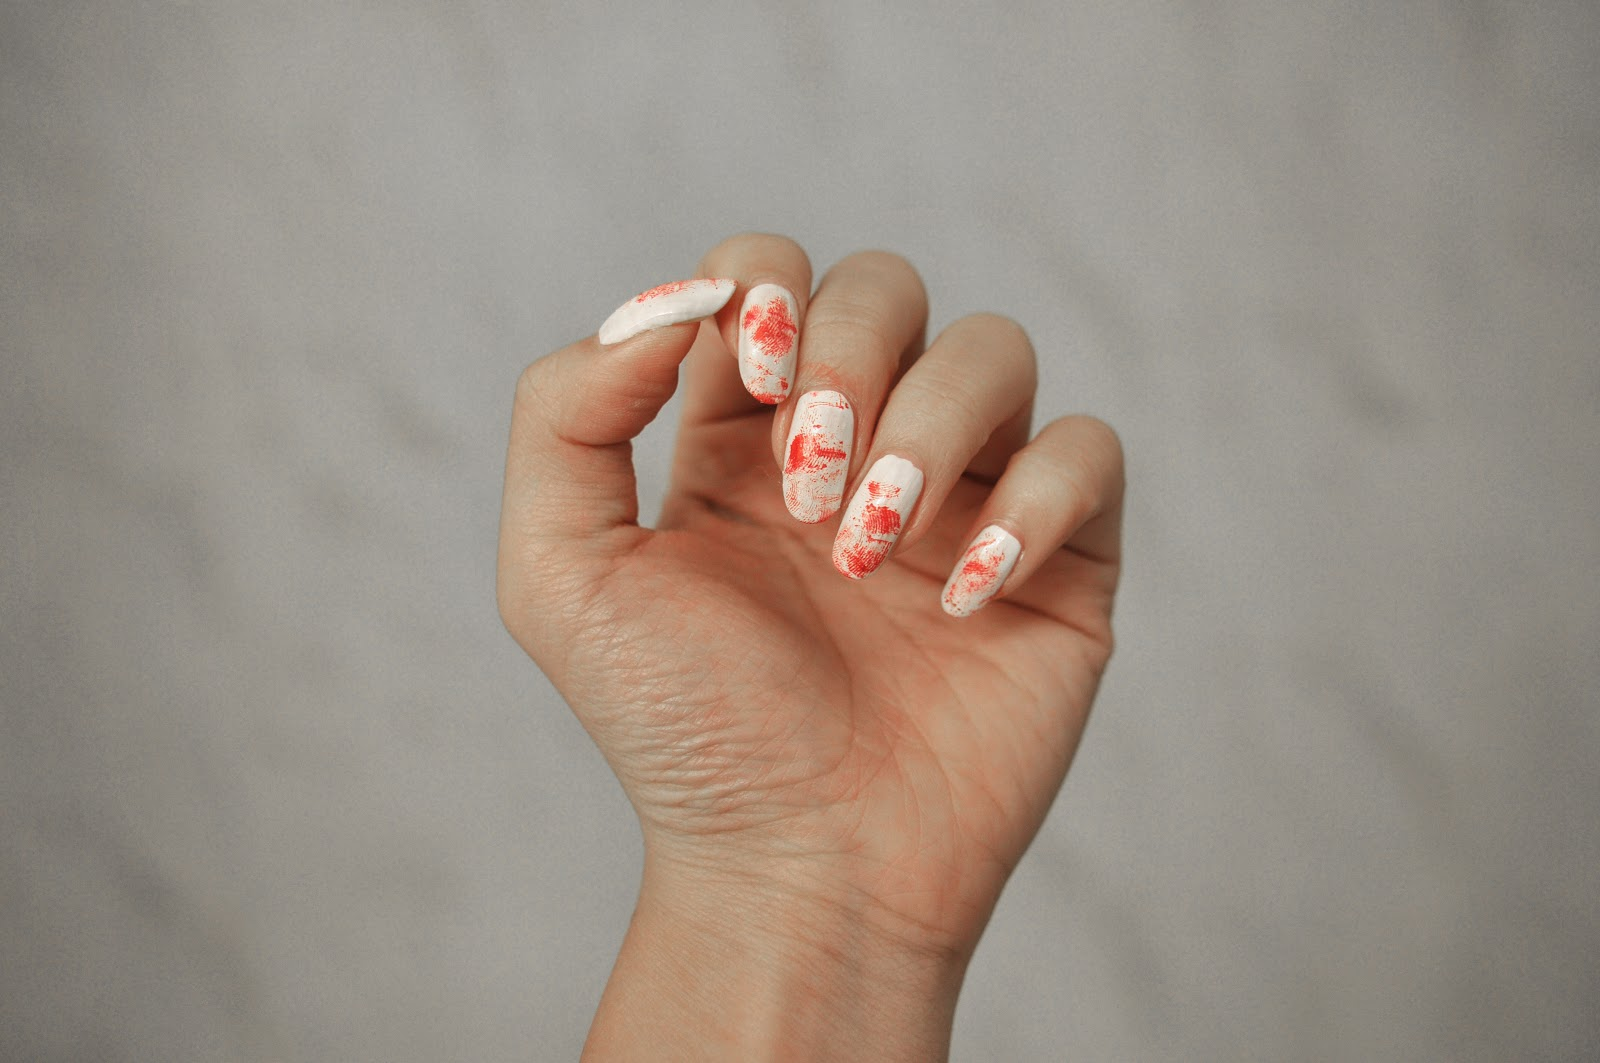 fun size beauty: halloween: csi bloody fingerprint nail art